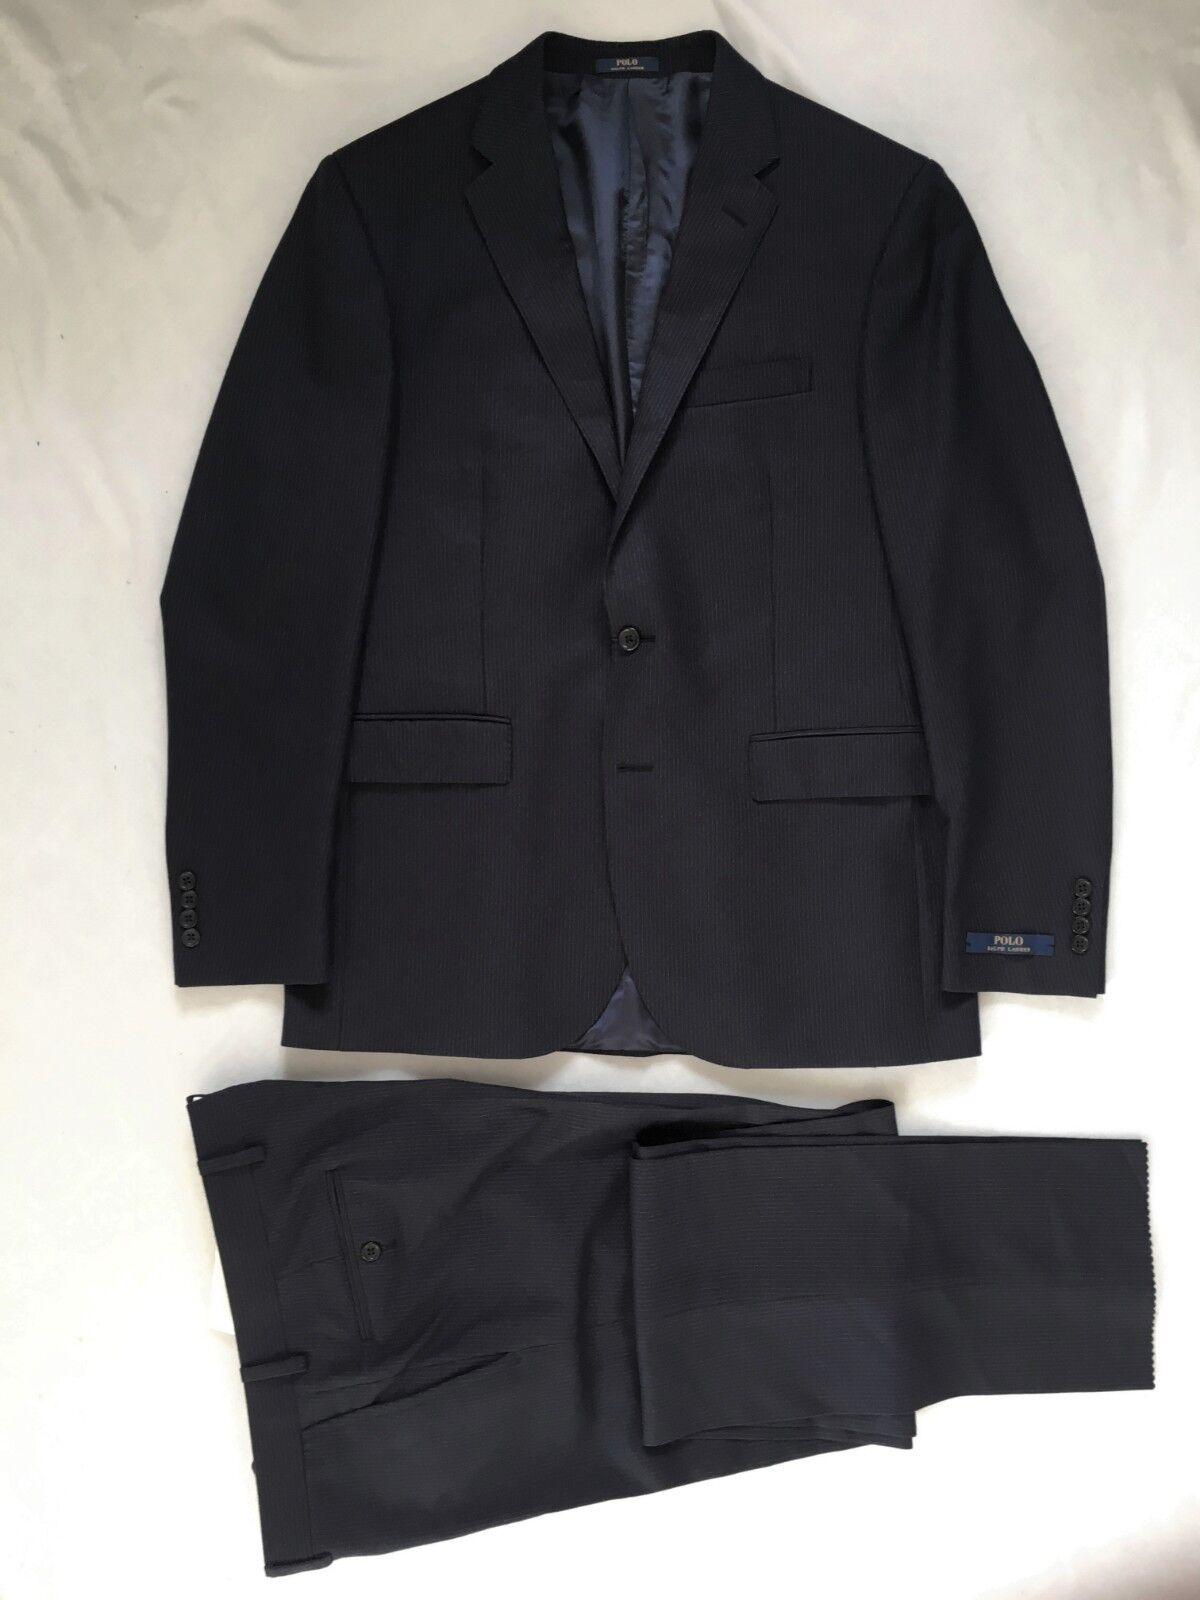 Polo Ralph Lauren, Anzug, 52 (US 42R), navy-Grau striped, custom fit, Wolle, neu